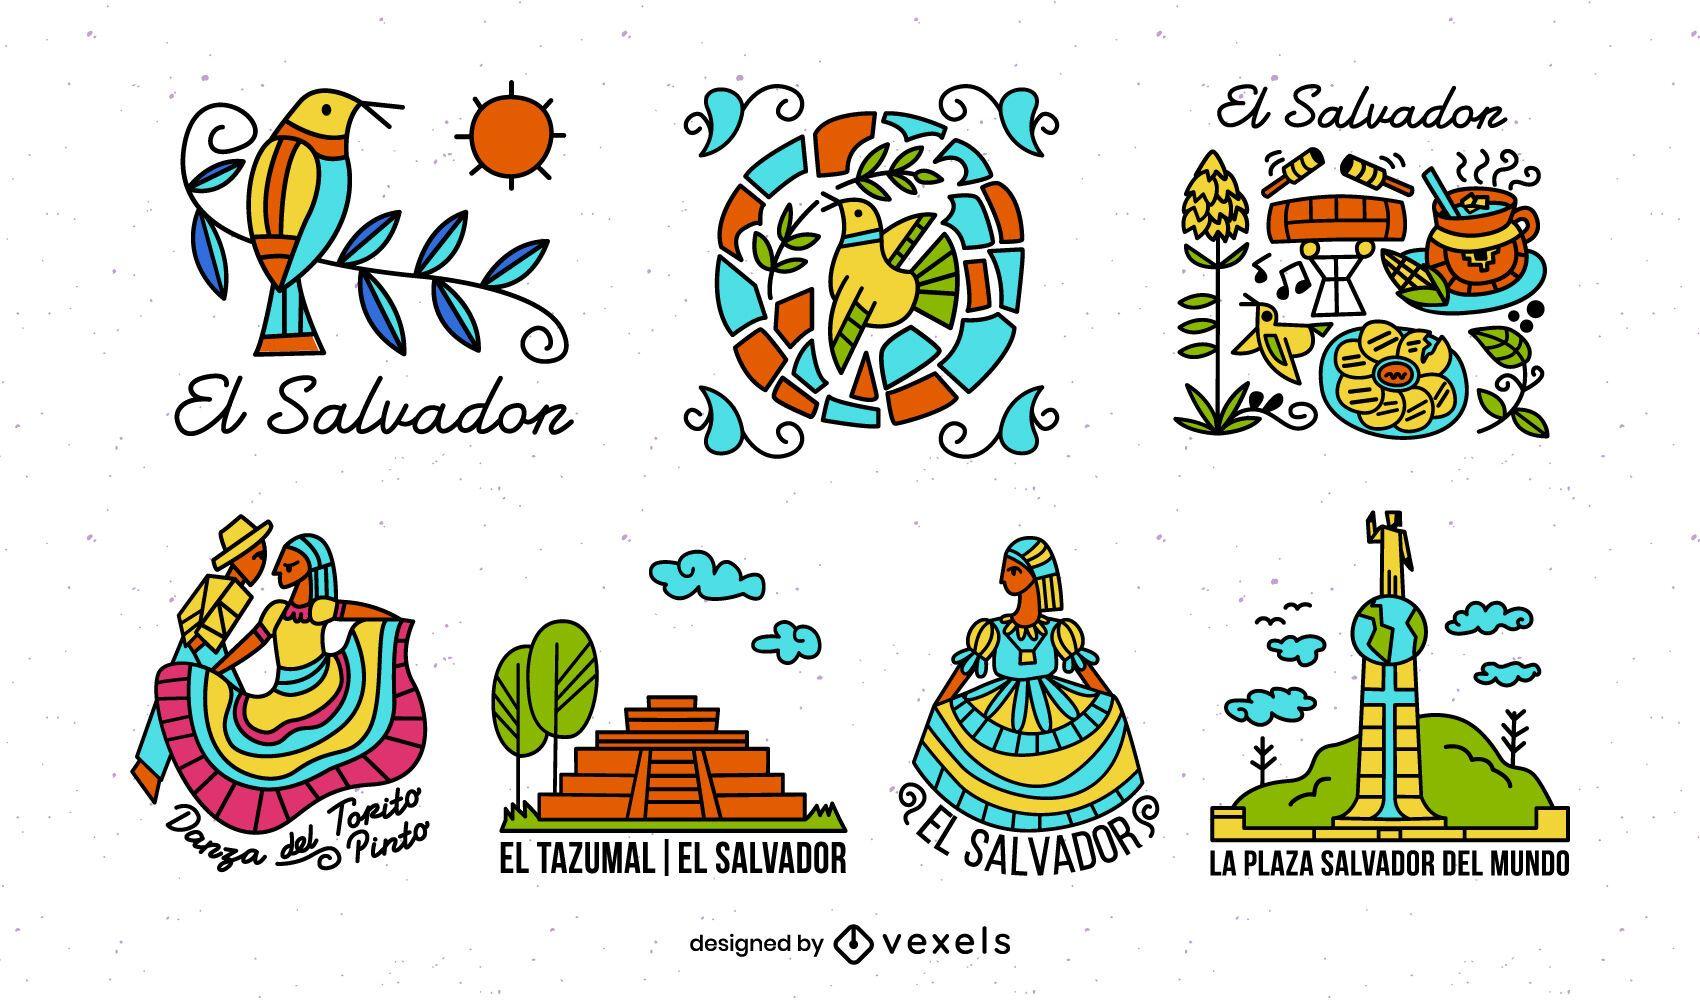 El Salvador Colorful Illustrated Elements Pack